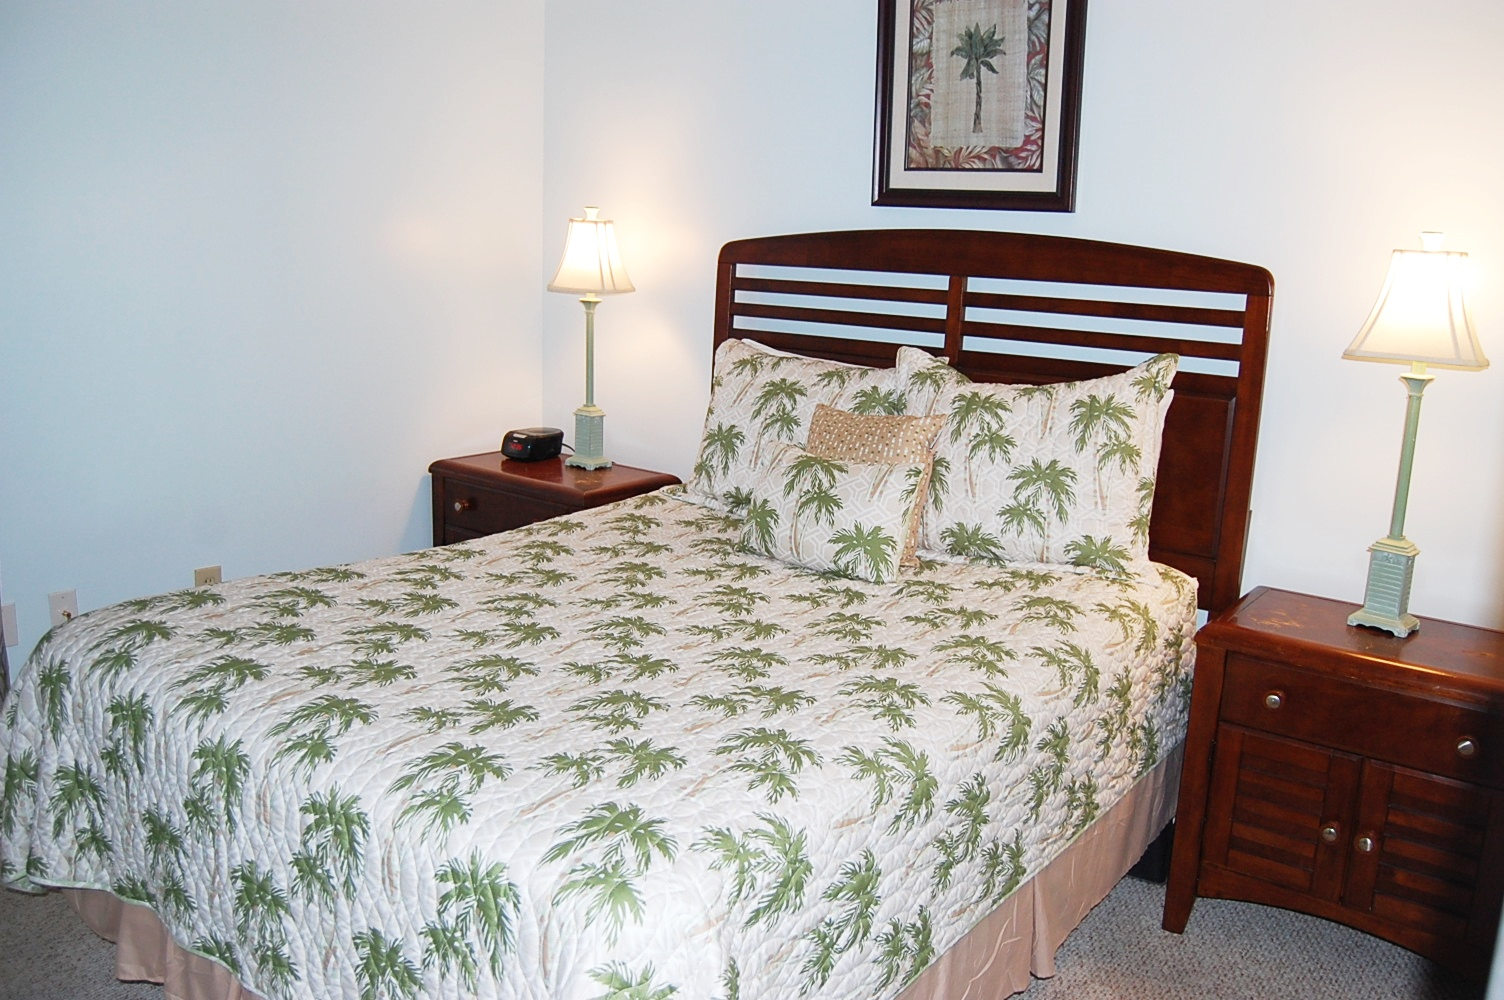 Island Winds West 177 Condo rental in Island Winds West in Gulf Shores Alabama - #20